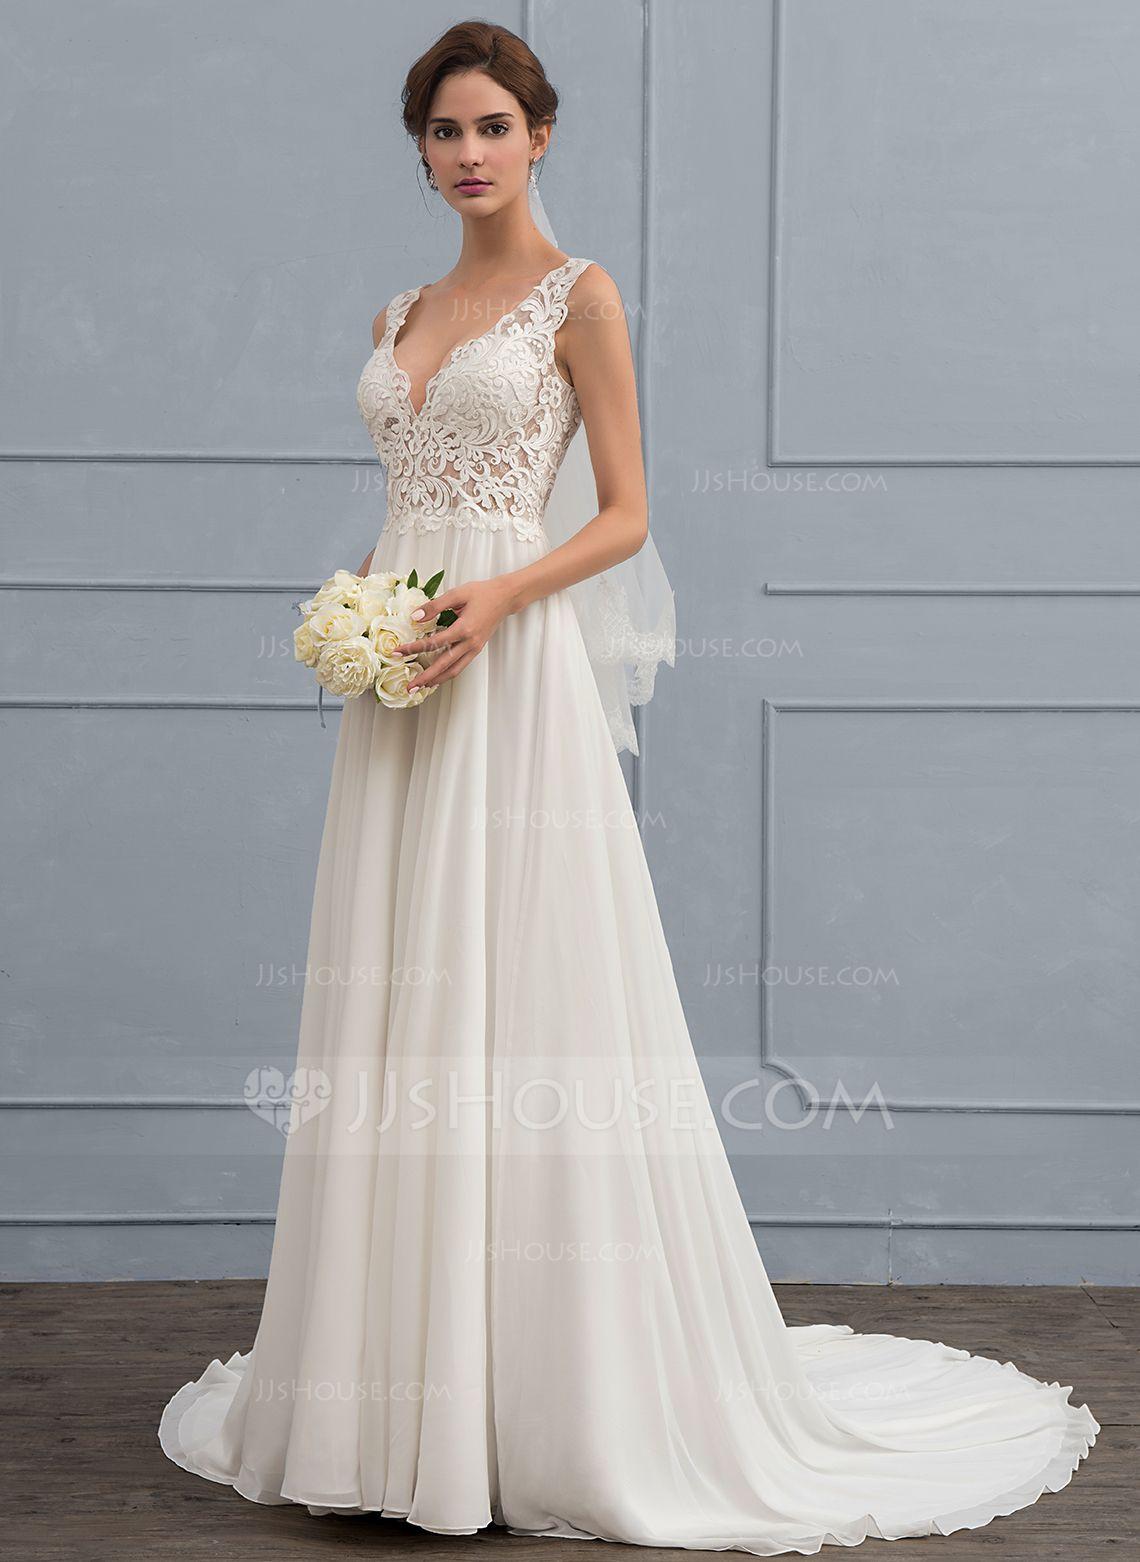 Jj Shouseuk On Twitter Cheap Wedding Dress Wedding Dresses Satin Wedding Dresses Lace